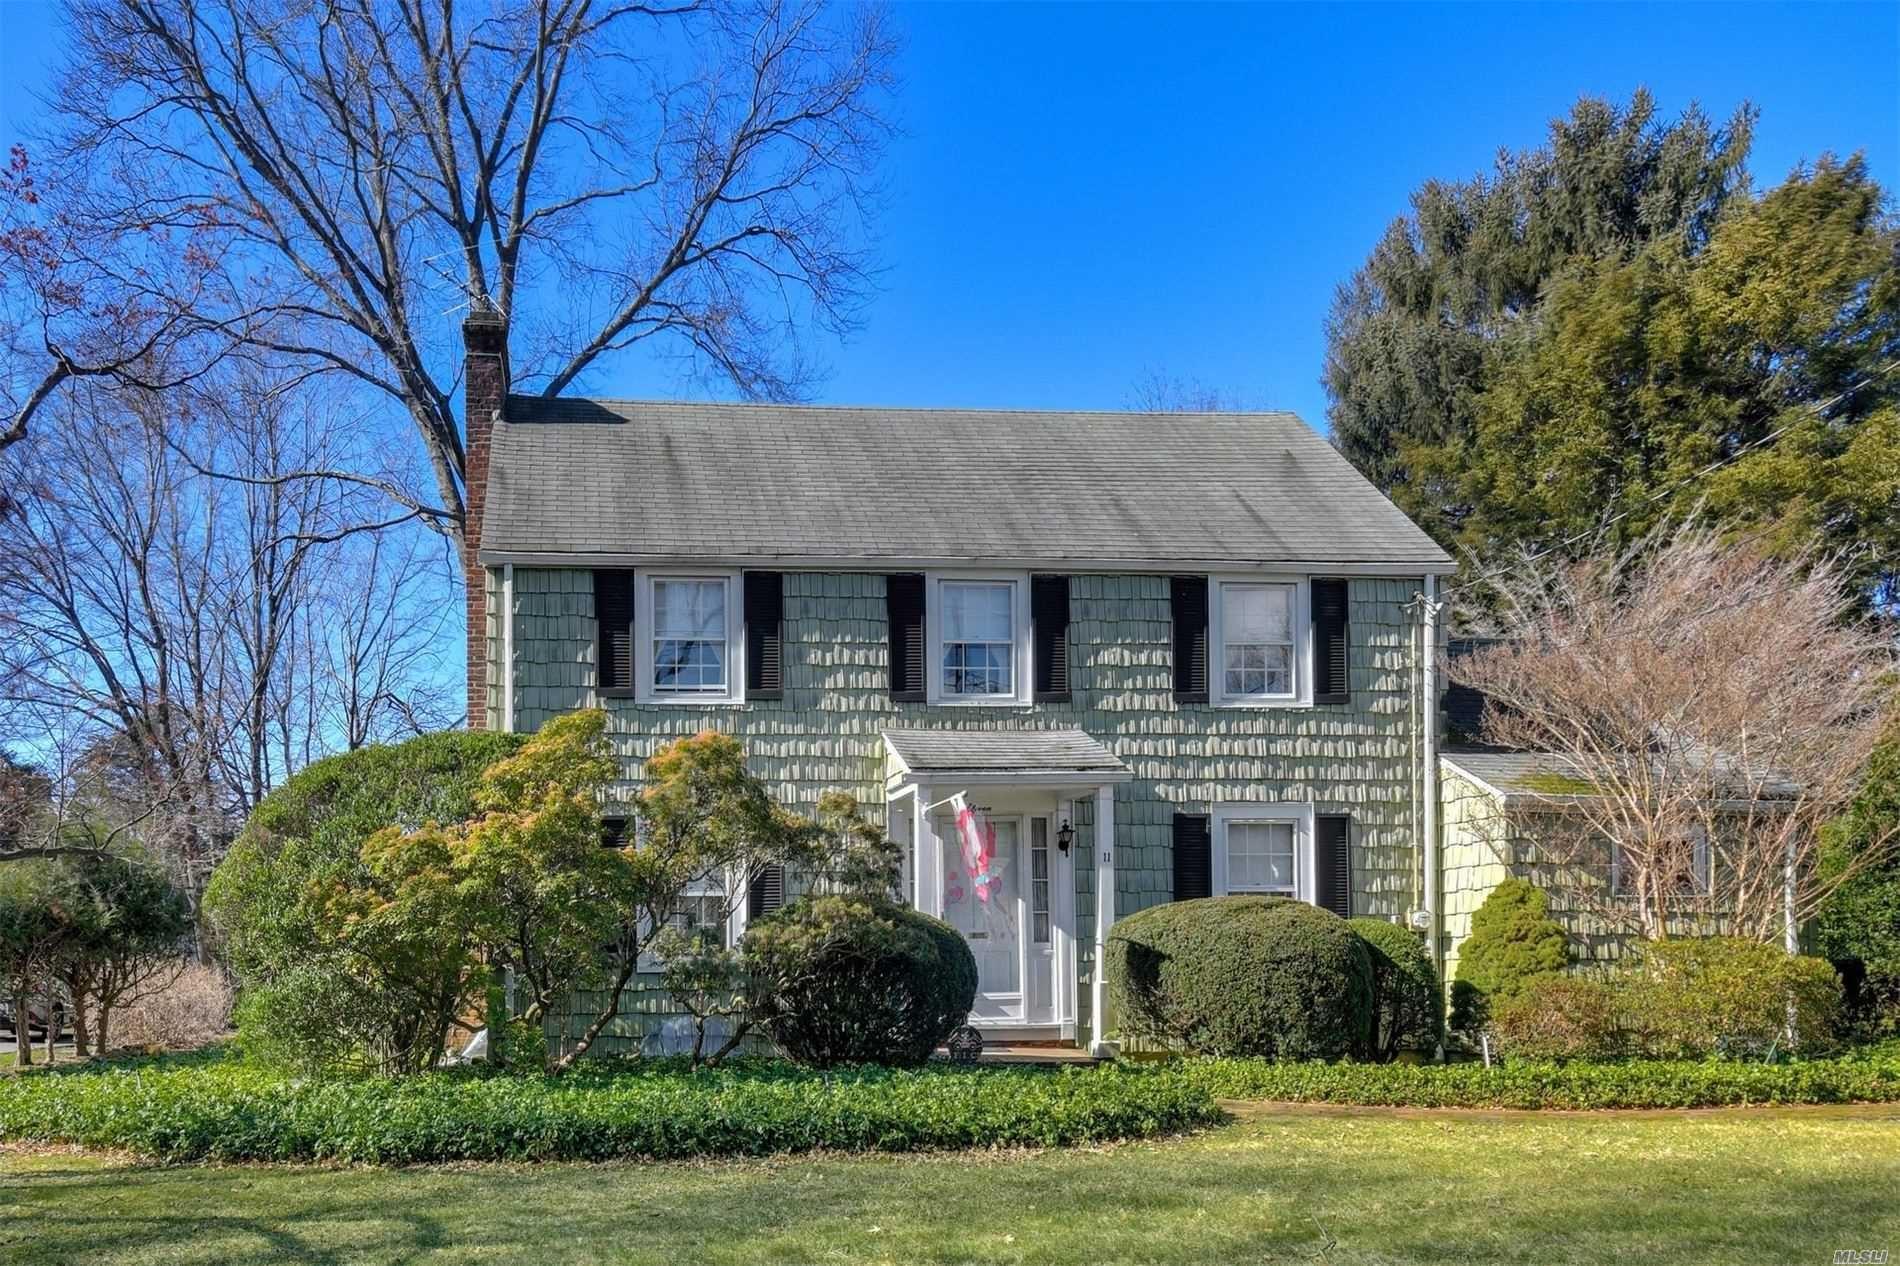 11 Orchard Drive, East Williston, NY 11596 - MLS#: 3201382